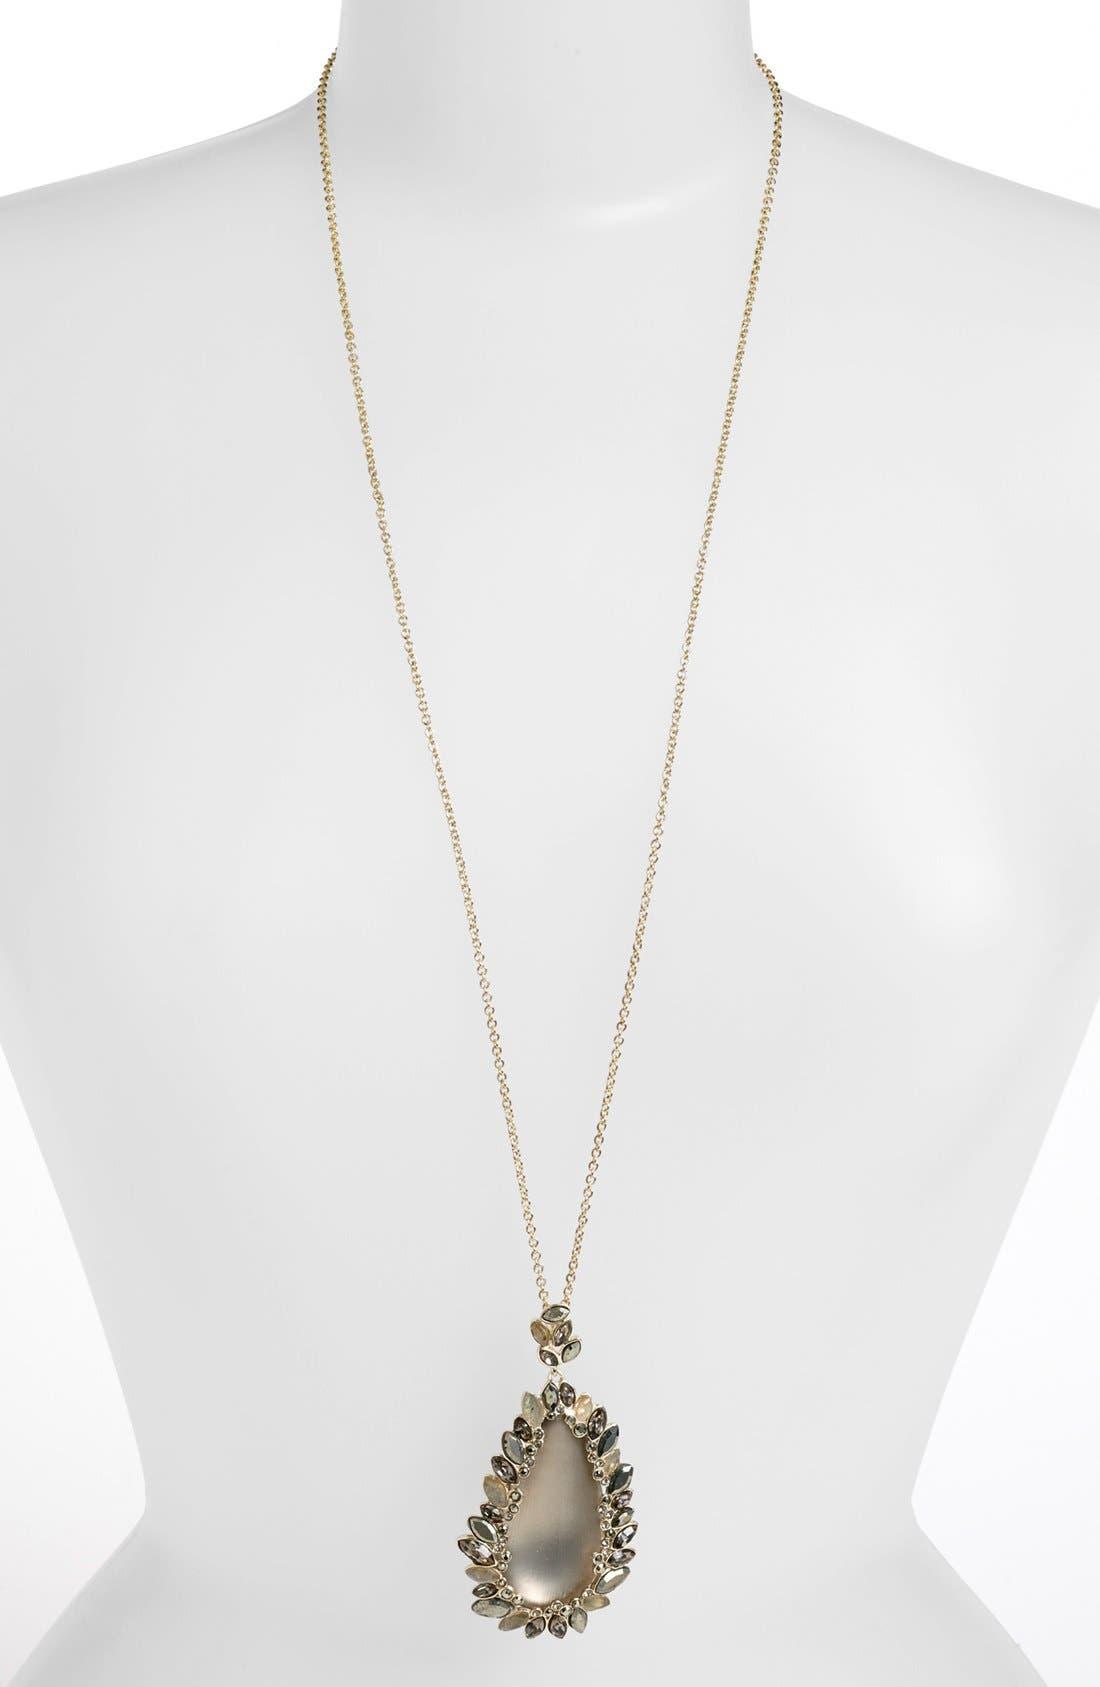 Alternate Image 1 Selected - Alexis Bittar 'Lucite® - Neo Bohemian' Long Paisley Pendant Necklace